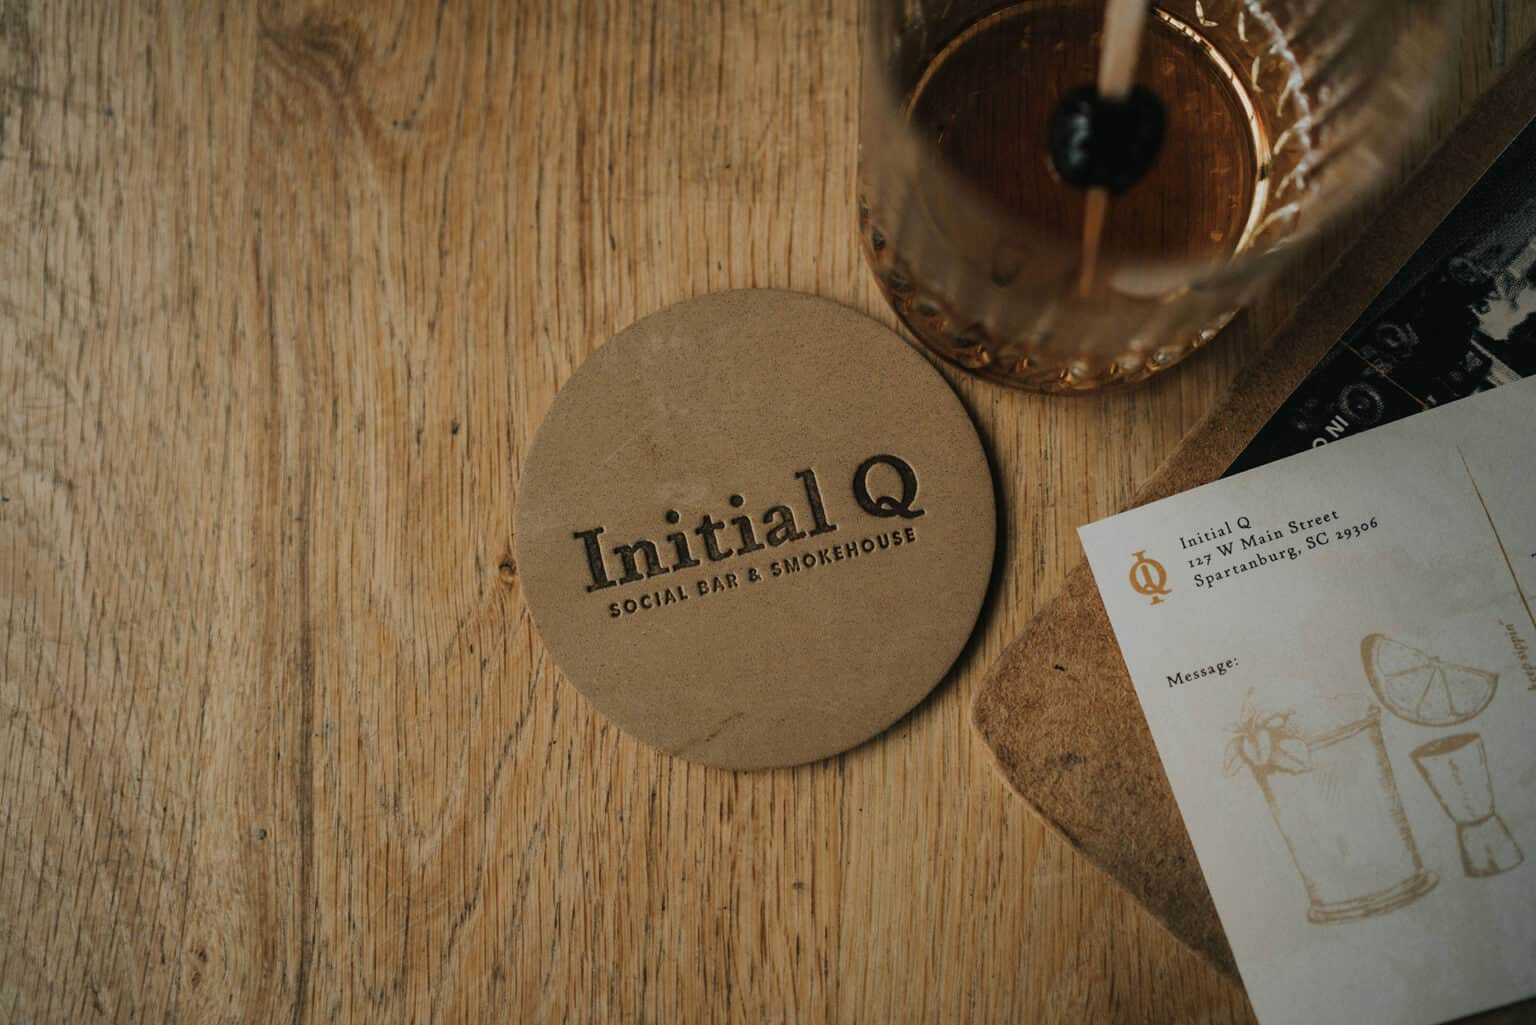 Initial Q barbecue full service restaurant branding & concept development